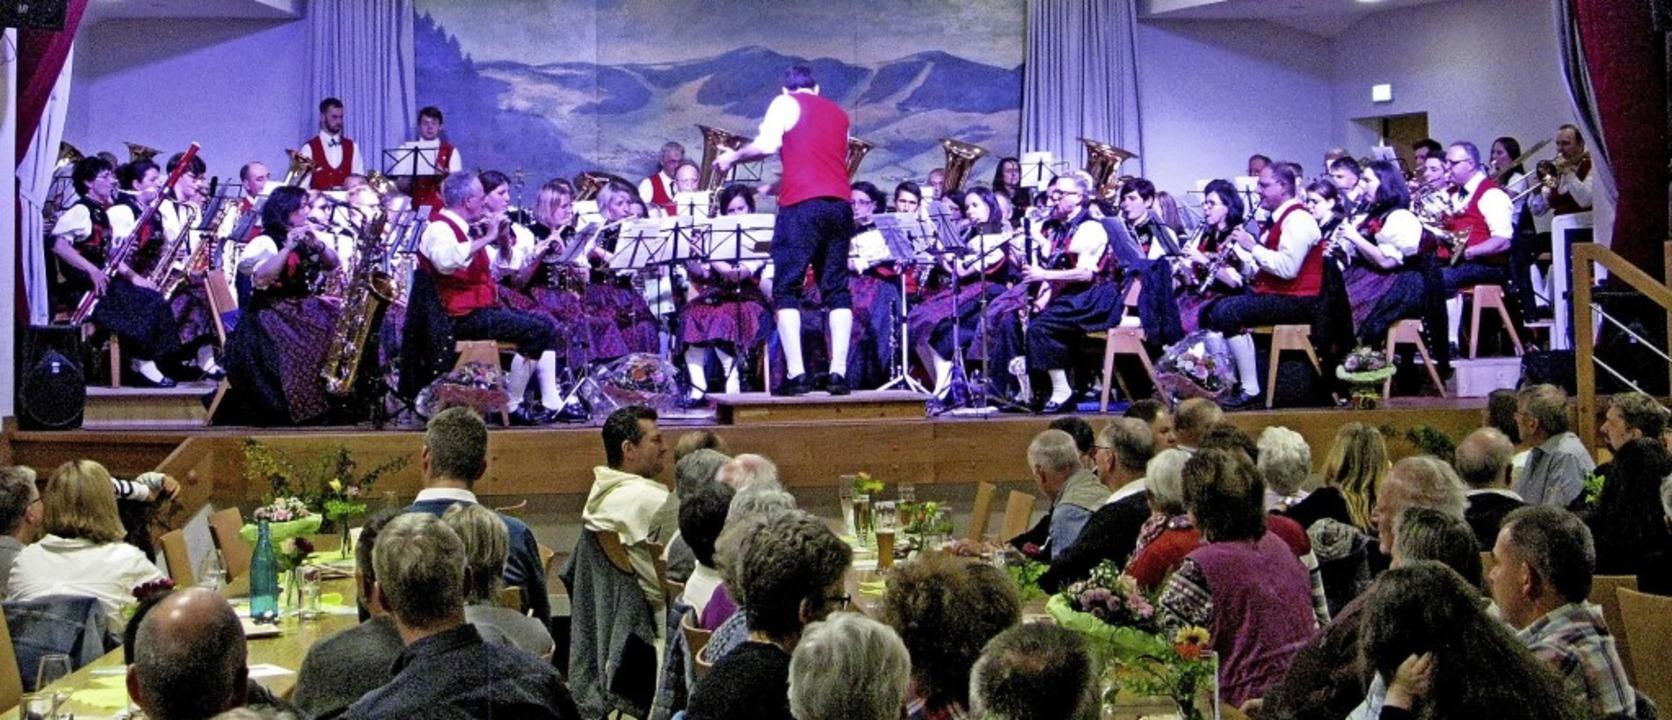 Musikverein Bernau bei seinem Frühlingskonzert im Kurhaus.    Foto: Ulrike Speigelhalter